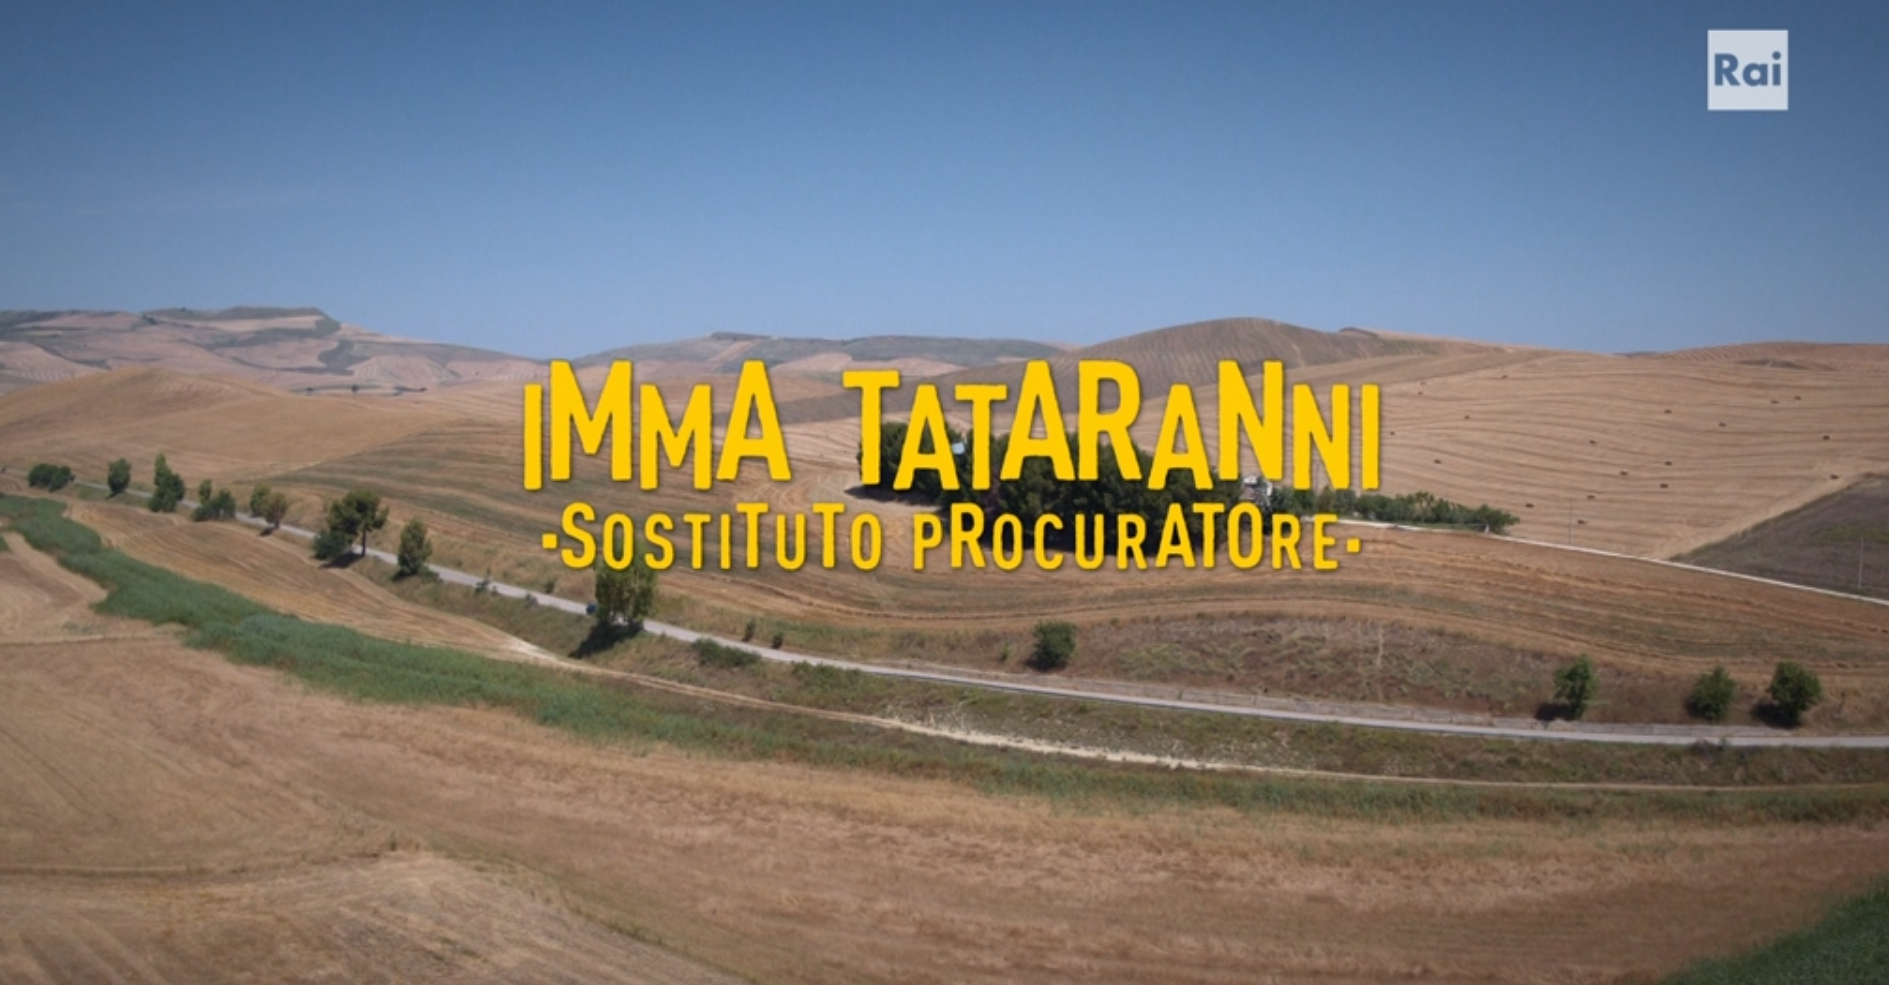 Imma Tataranni: un procuratore sui generis